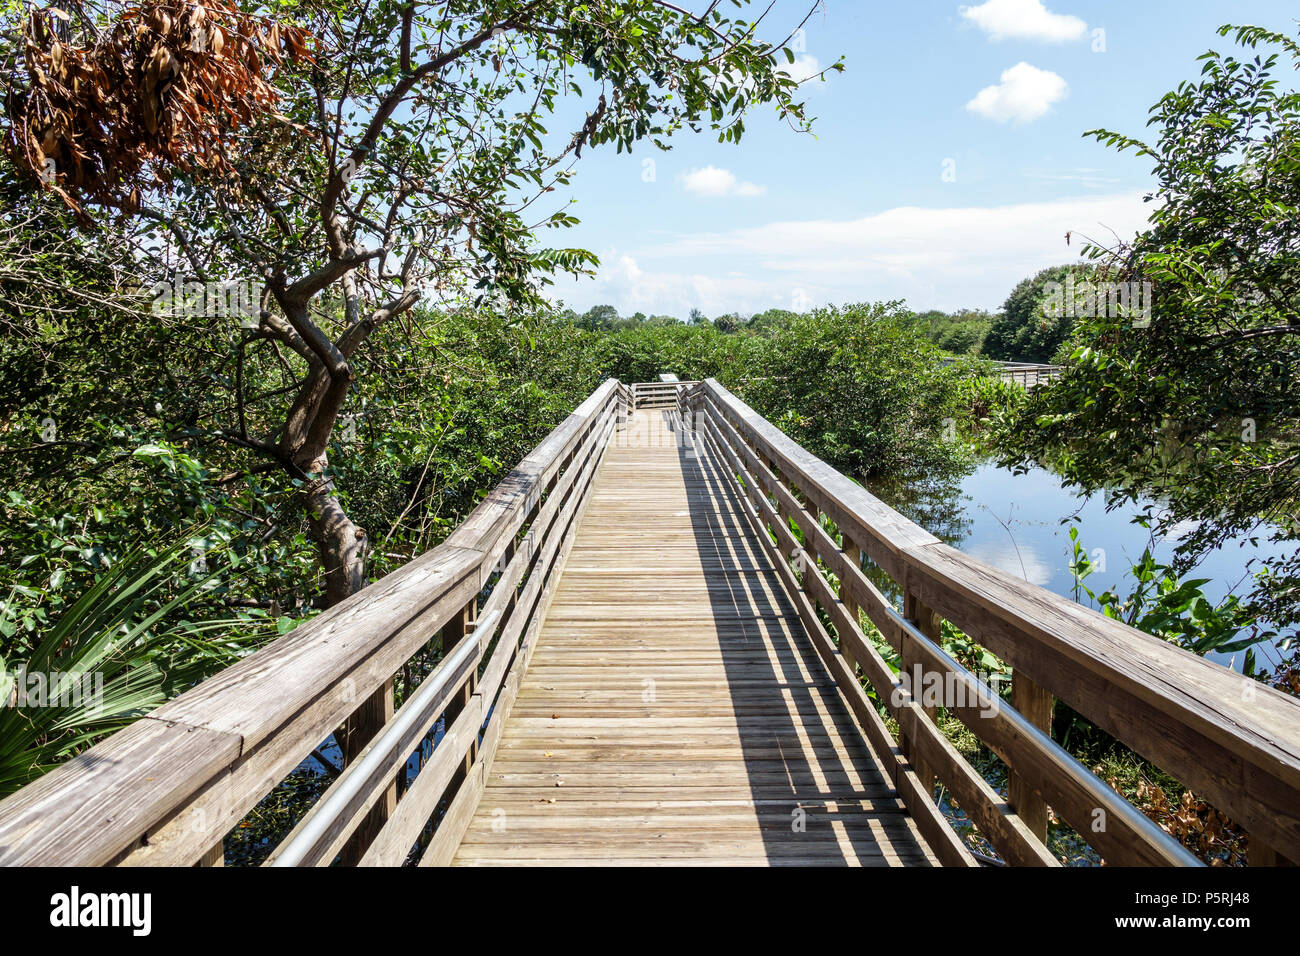 Delray Beach Florida Wakodahatchee Wetlands nature wildlife preserve park boardwalk trail protected bird habitat water reclamation project - Stock Image